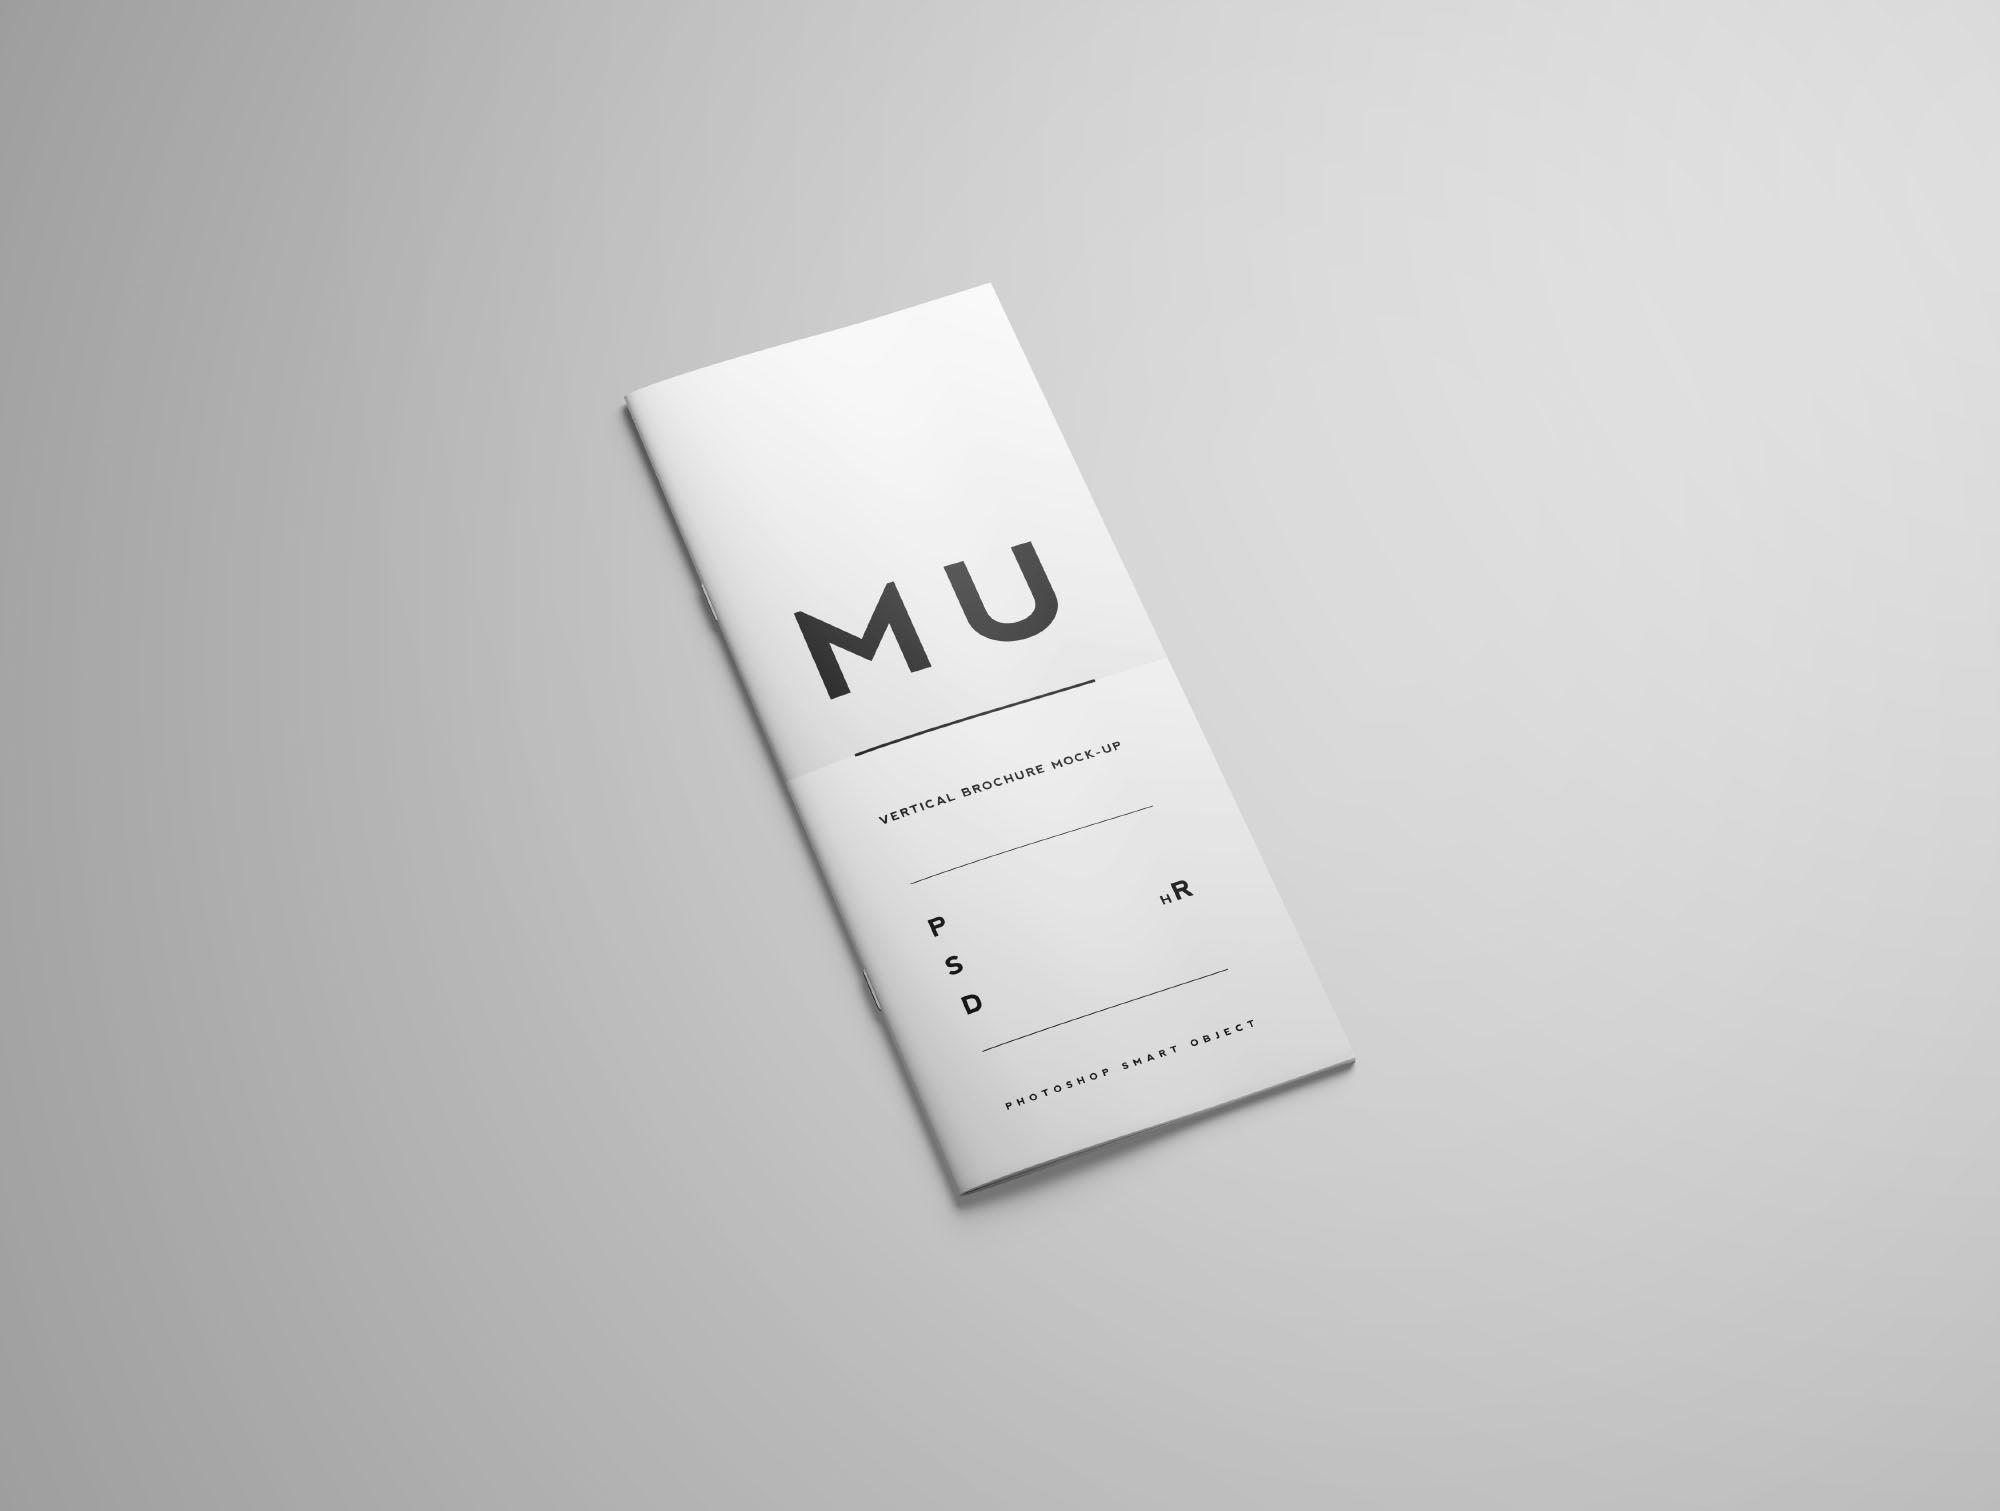 Vertical Brochure Mockup In 2021 Mockup Free Psd Mockup Brochure